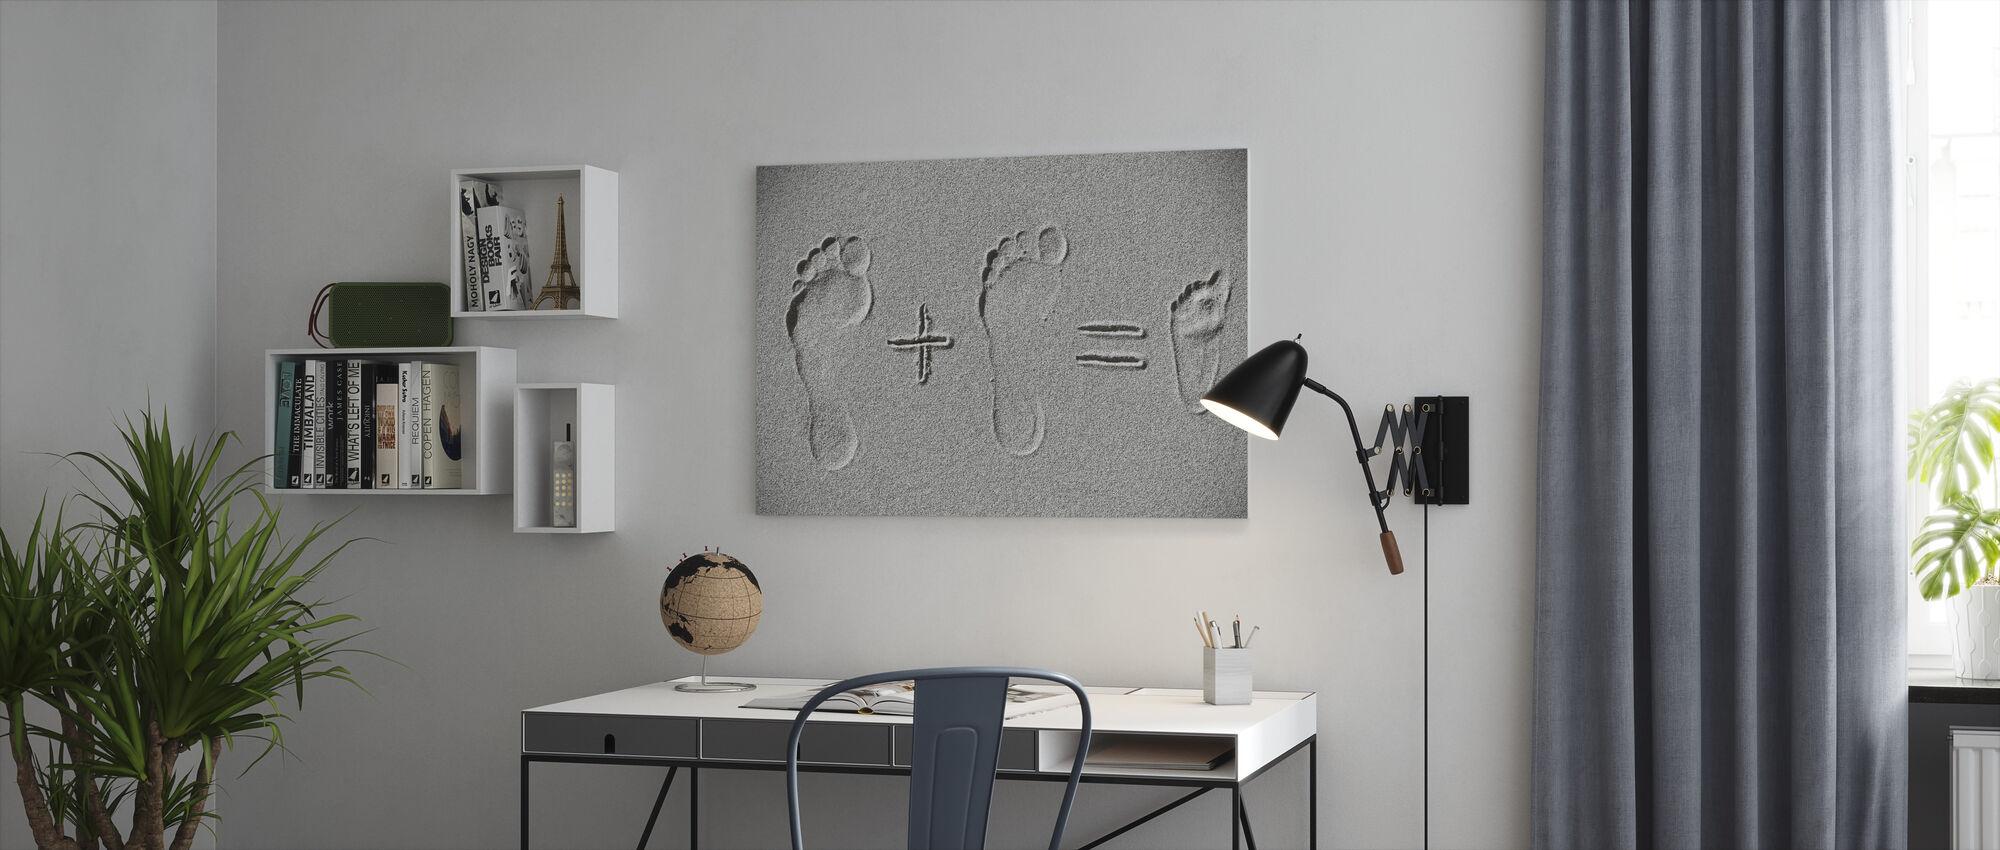 Sand aritmetik - Canvastavla - Kontor